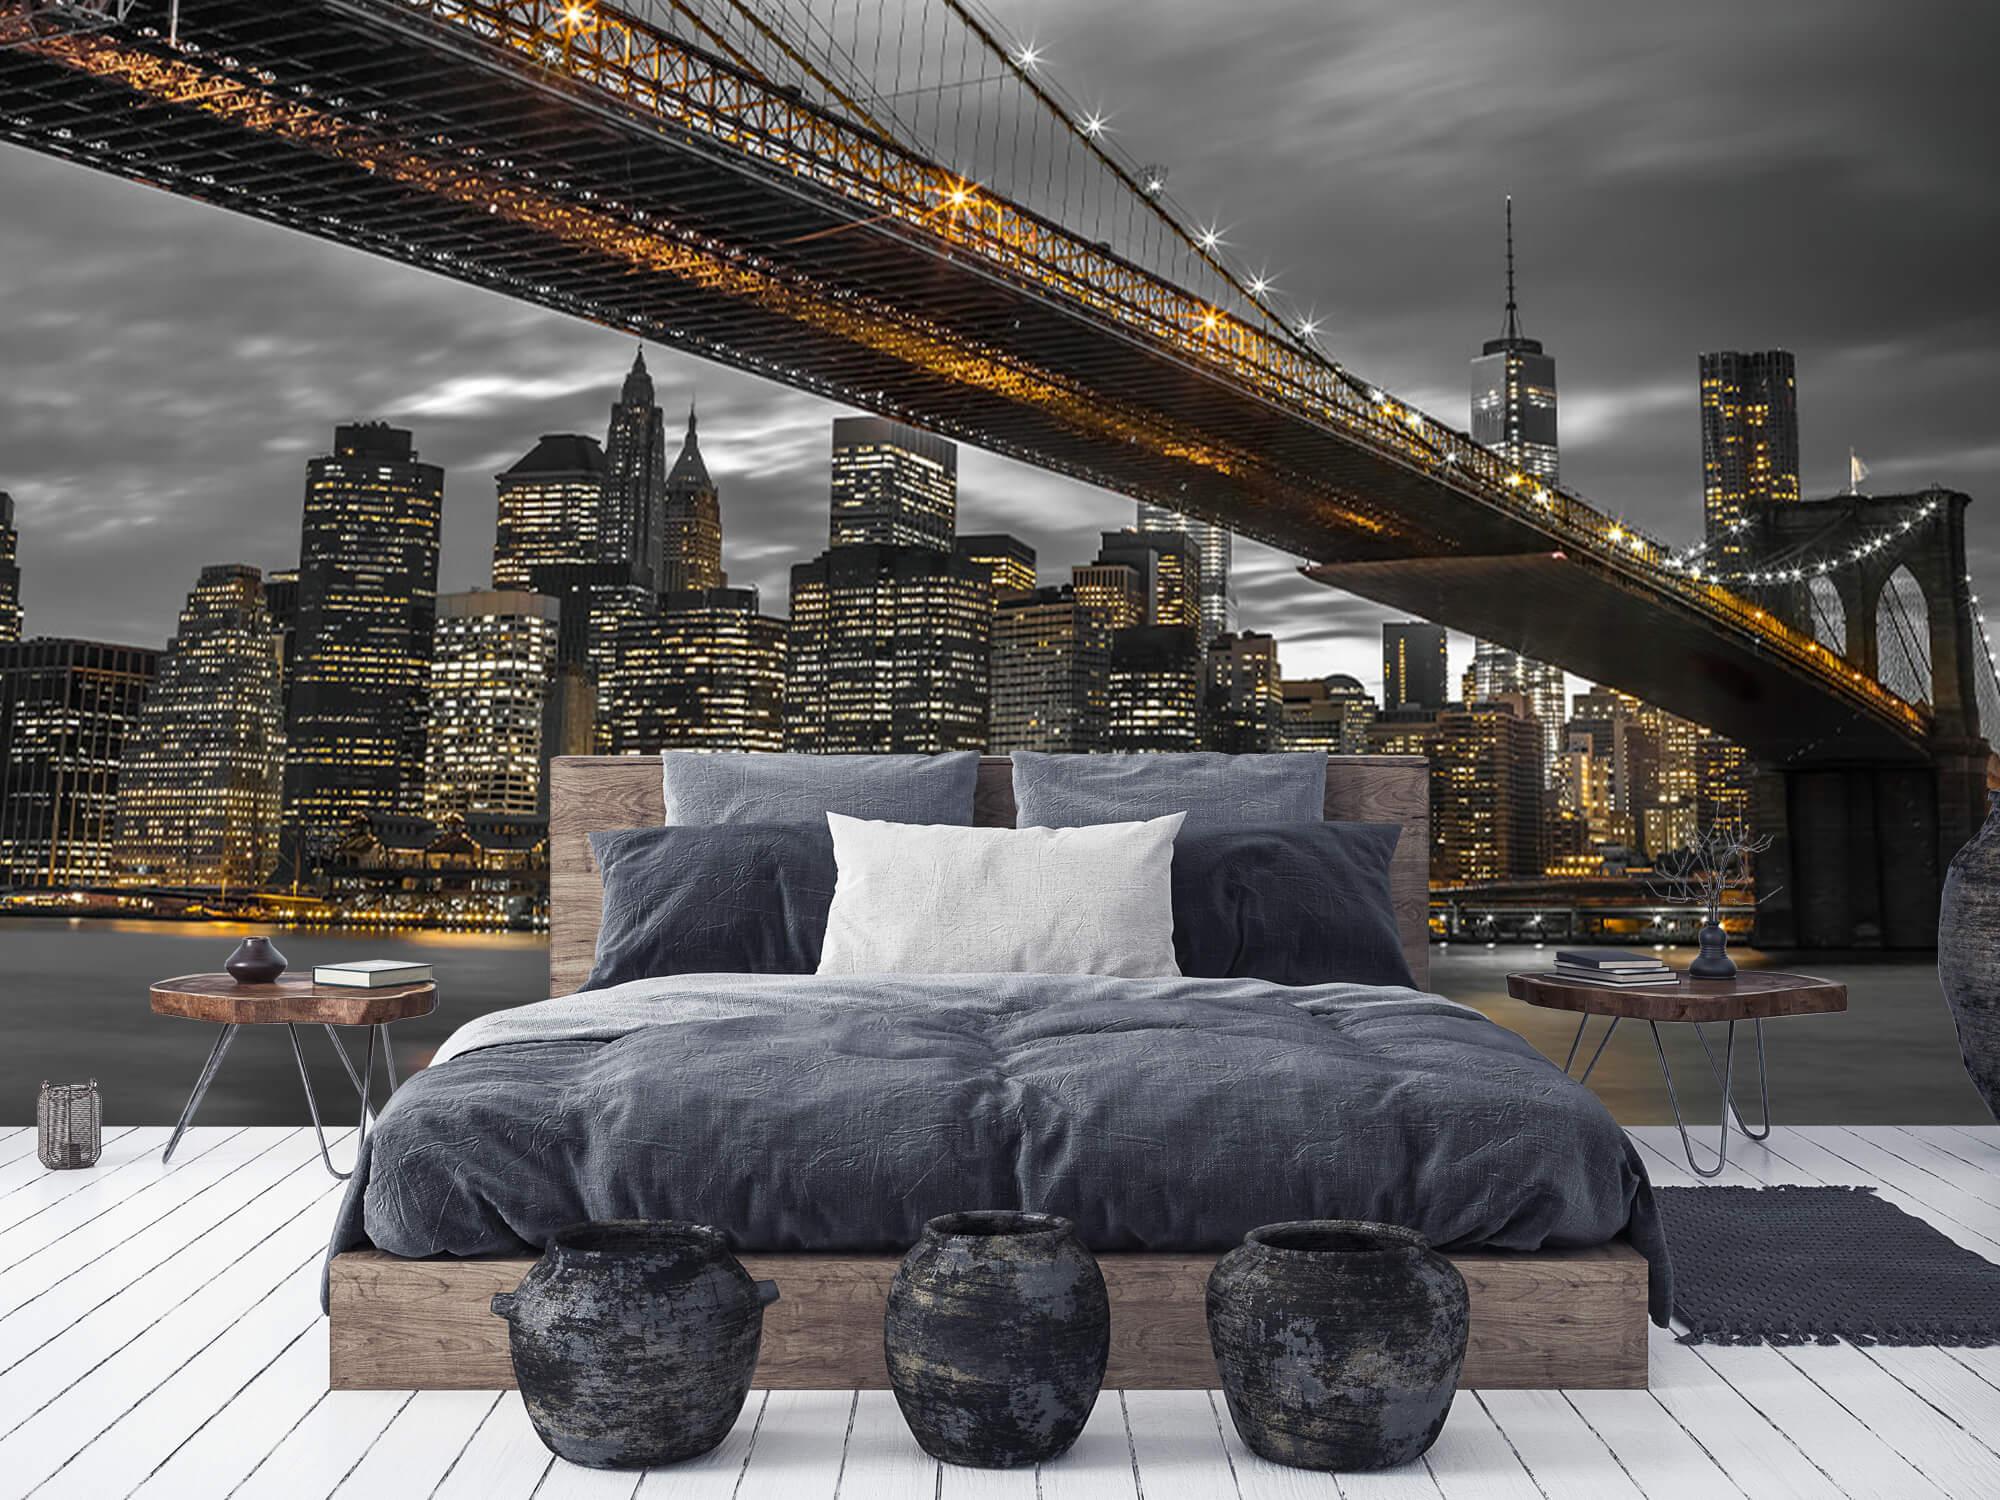 Brooklyn Bridge, New York 8